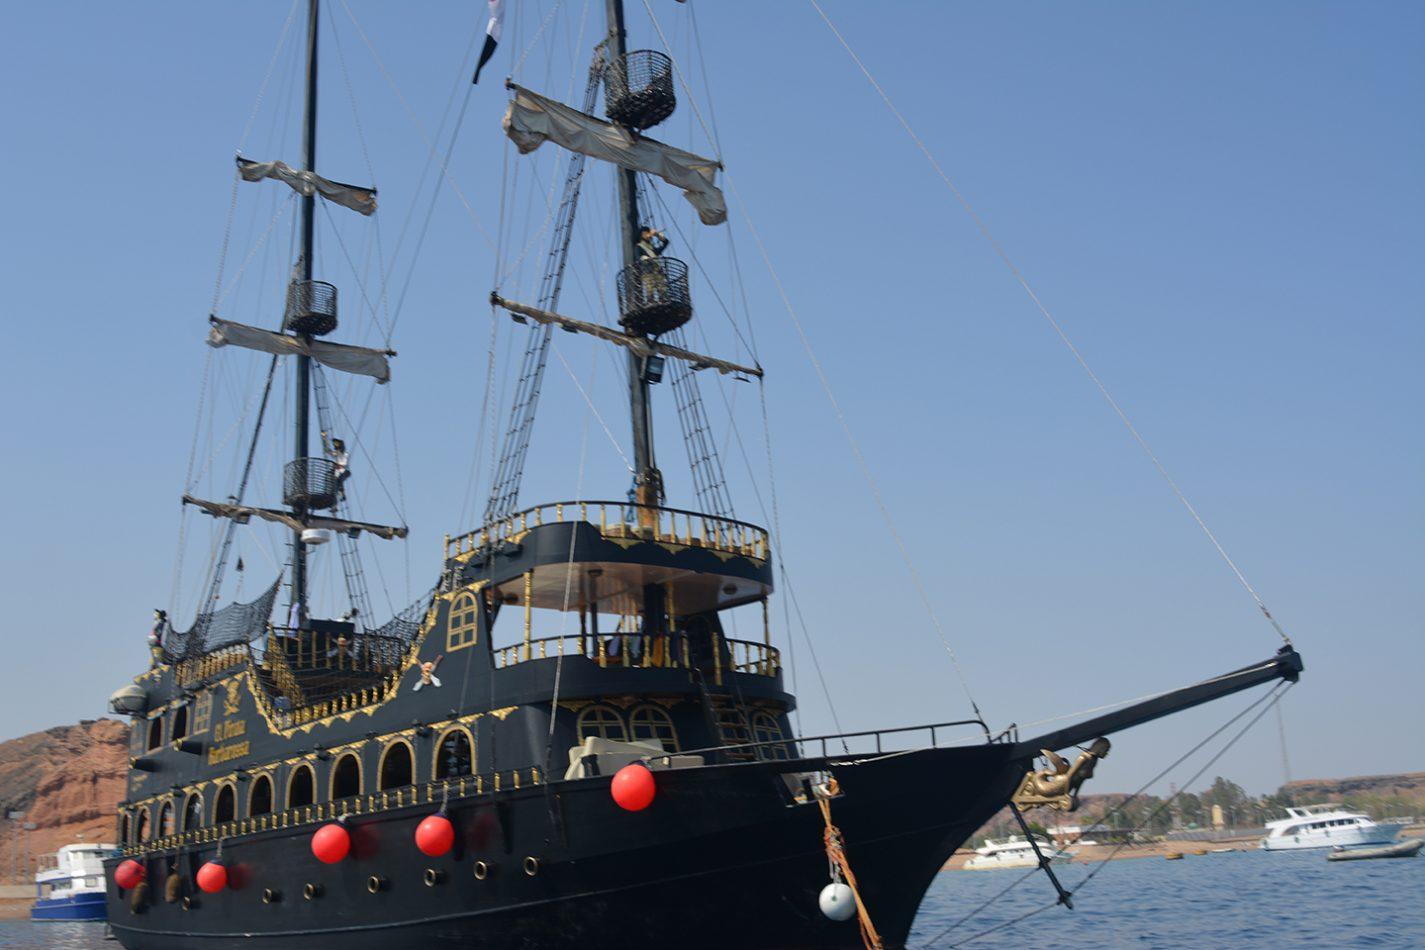 El Pirata Barbarossa